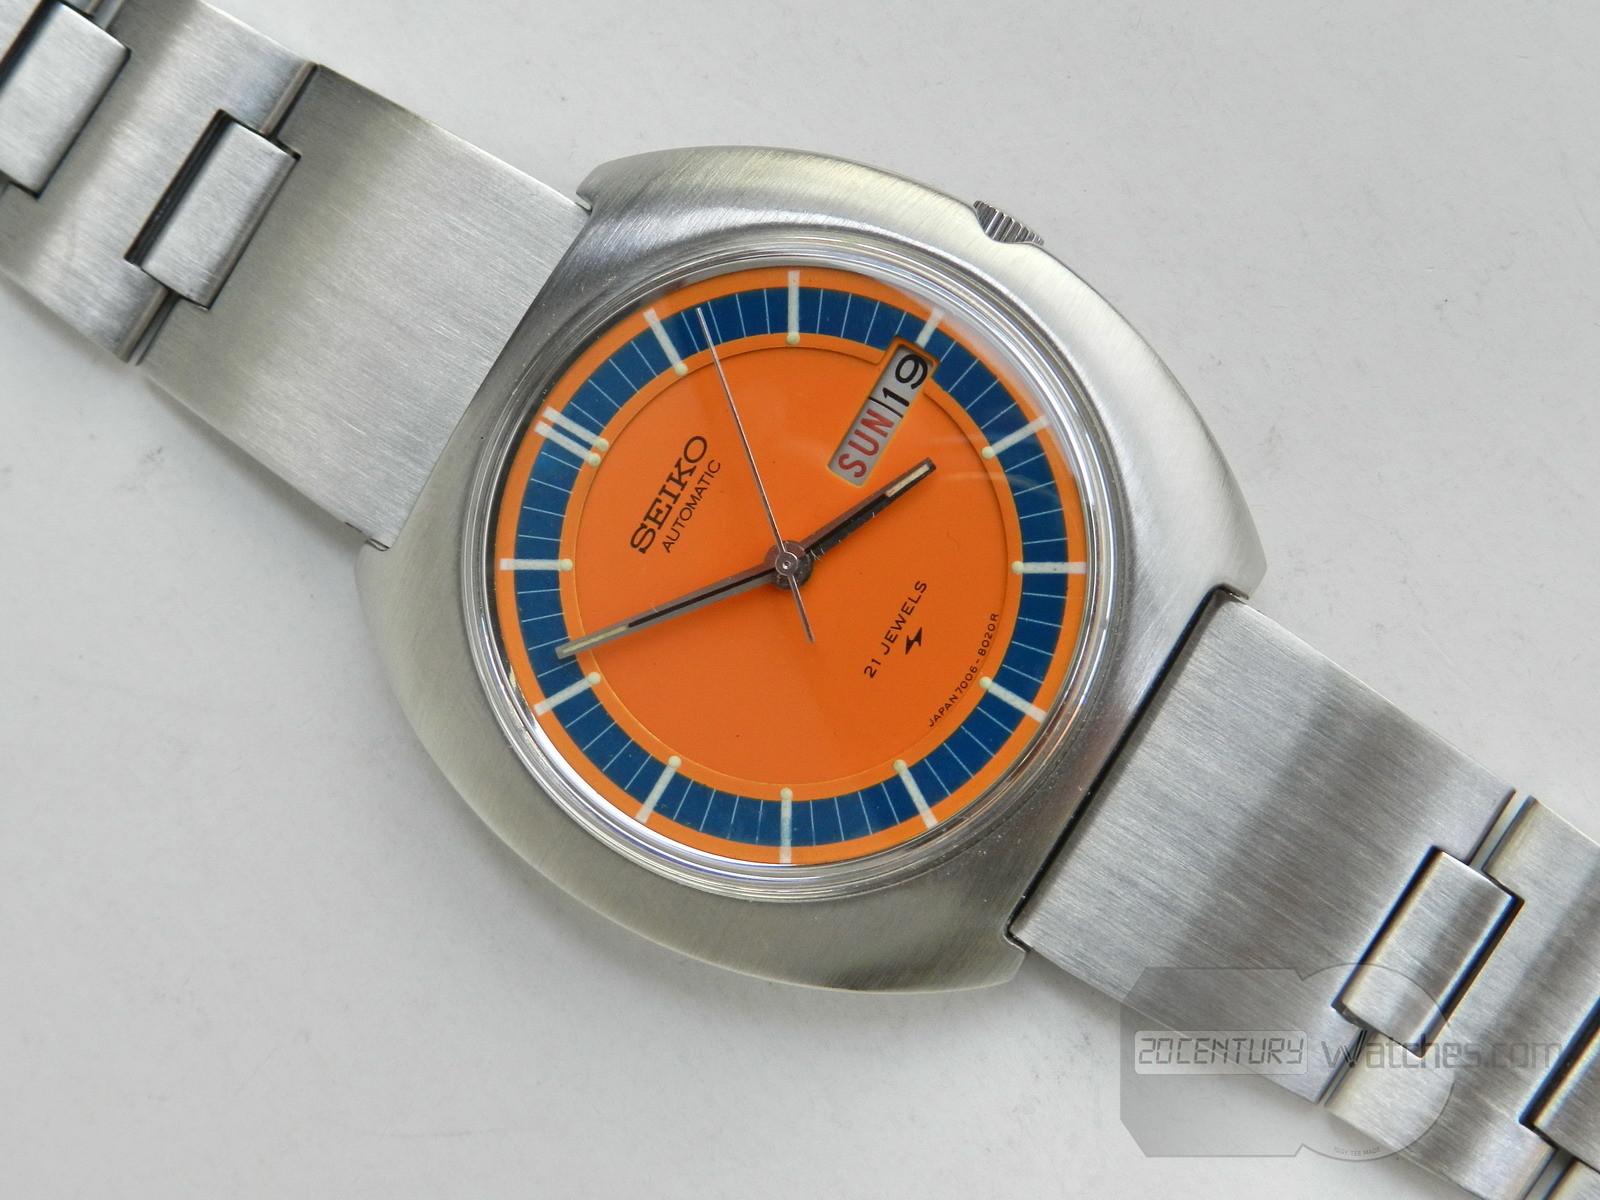 Seiko Automatic 7006-8020